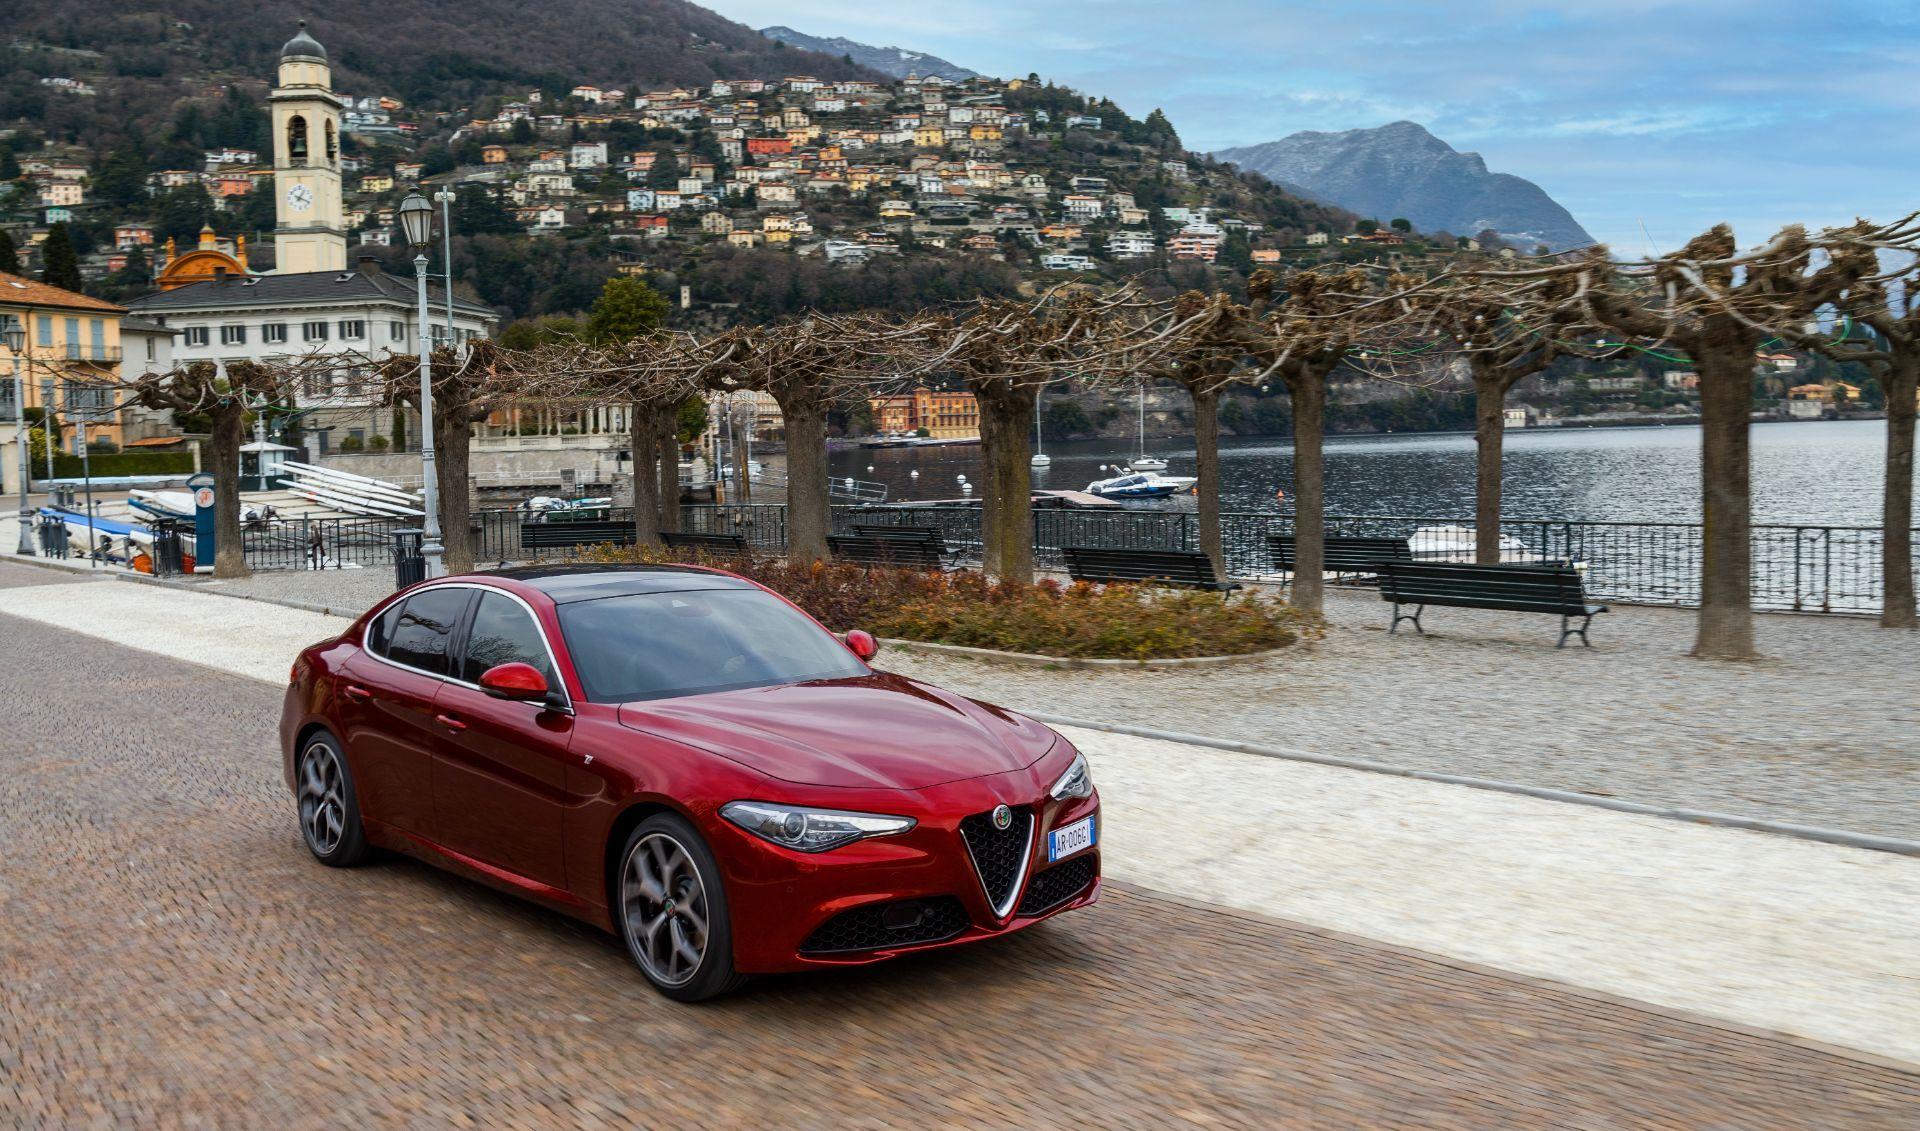 Alfa-Romeo-Giulia-and-Stelvio-6C-Villa-dEste-17